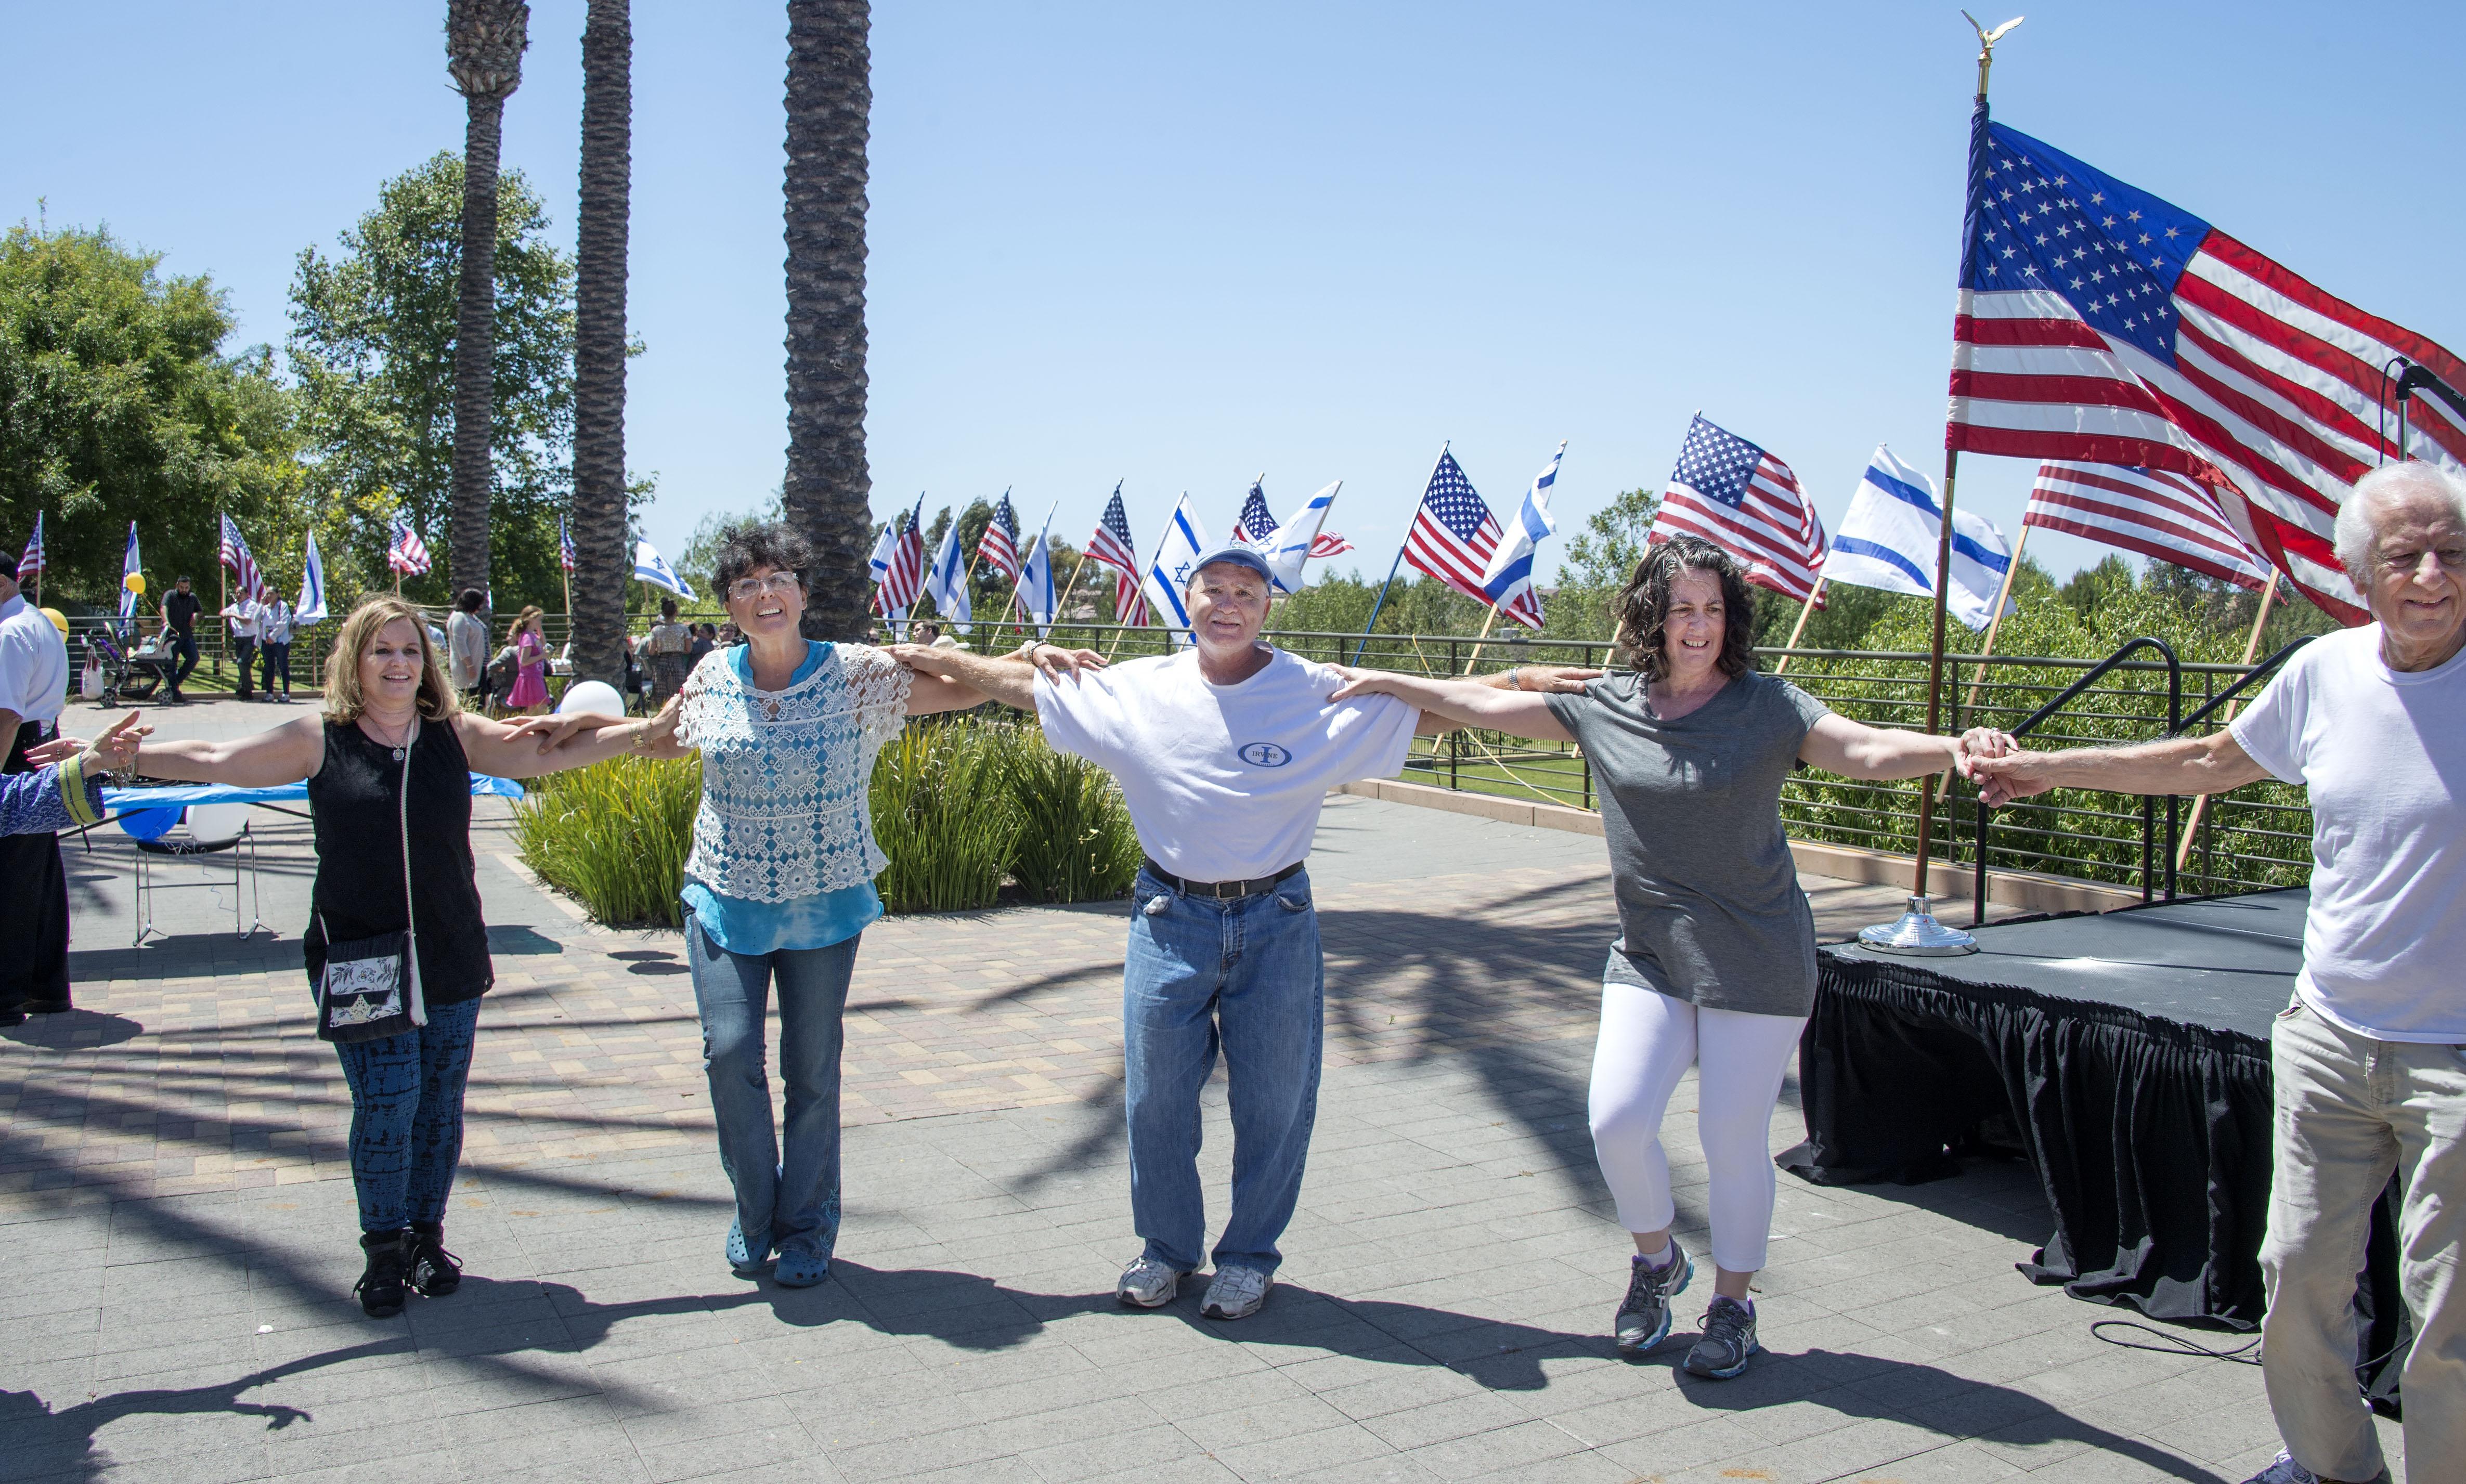 Steve greenberg irvine audit - Celebrate Israel 2017 Presented In Partnership Jffs Merage Jcc